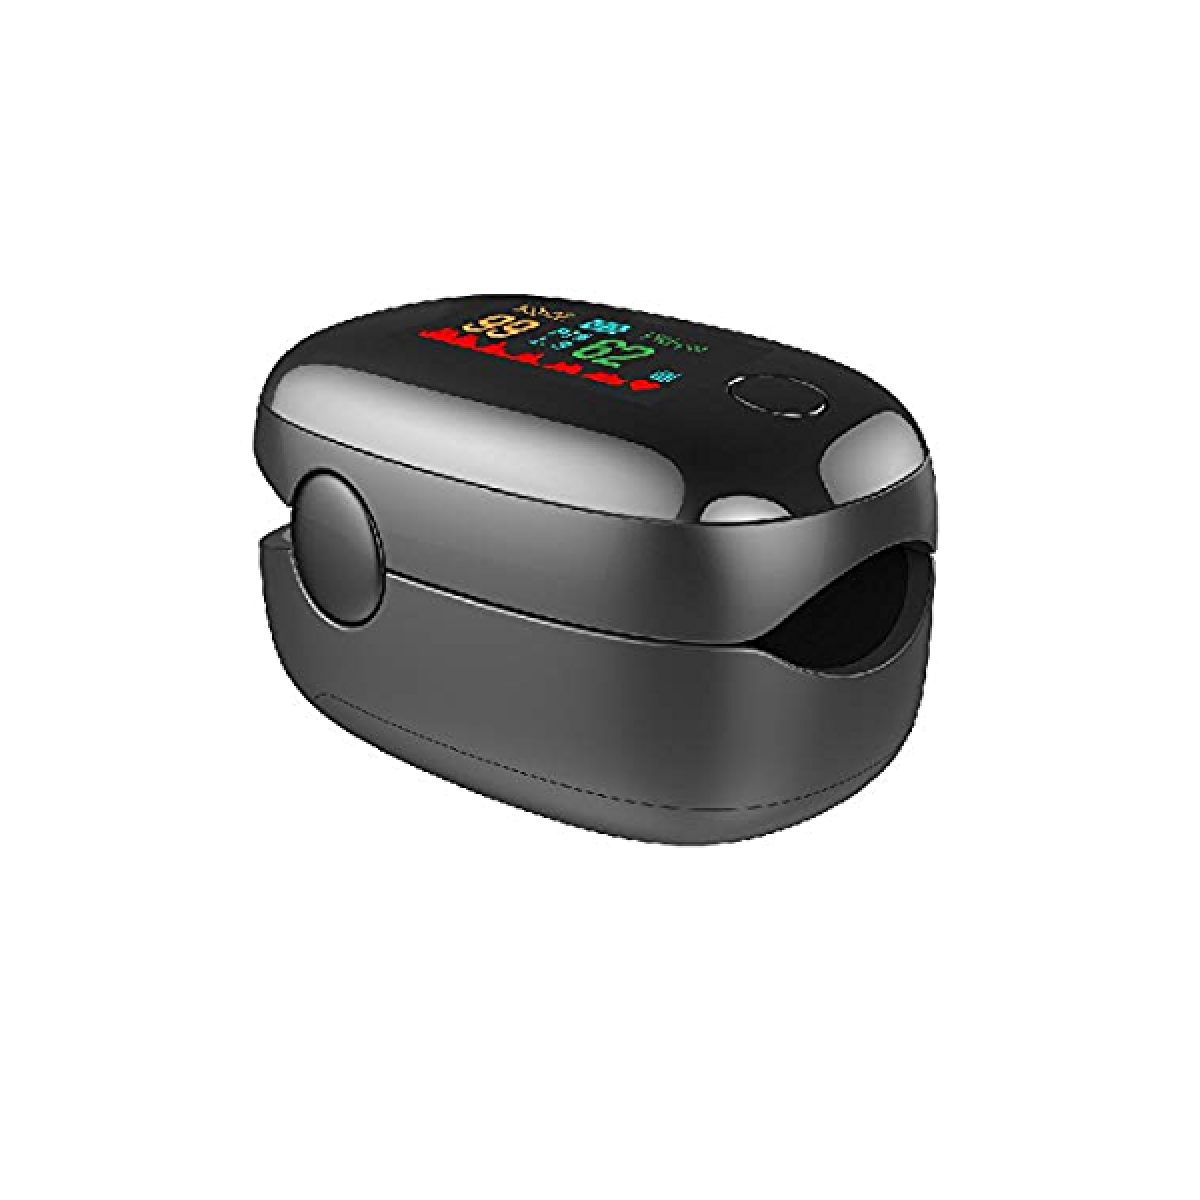 Nano Portable USB Rechargable Mini Santizer (30ml) 手提迷你消毒喷雾机 /Oximeter